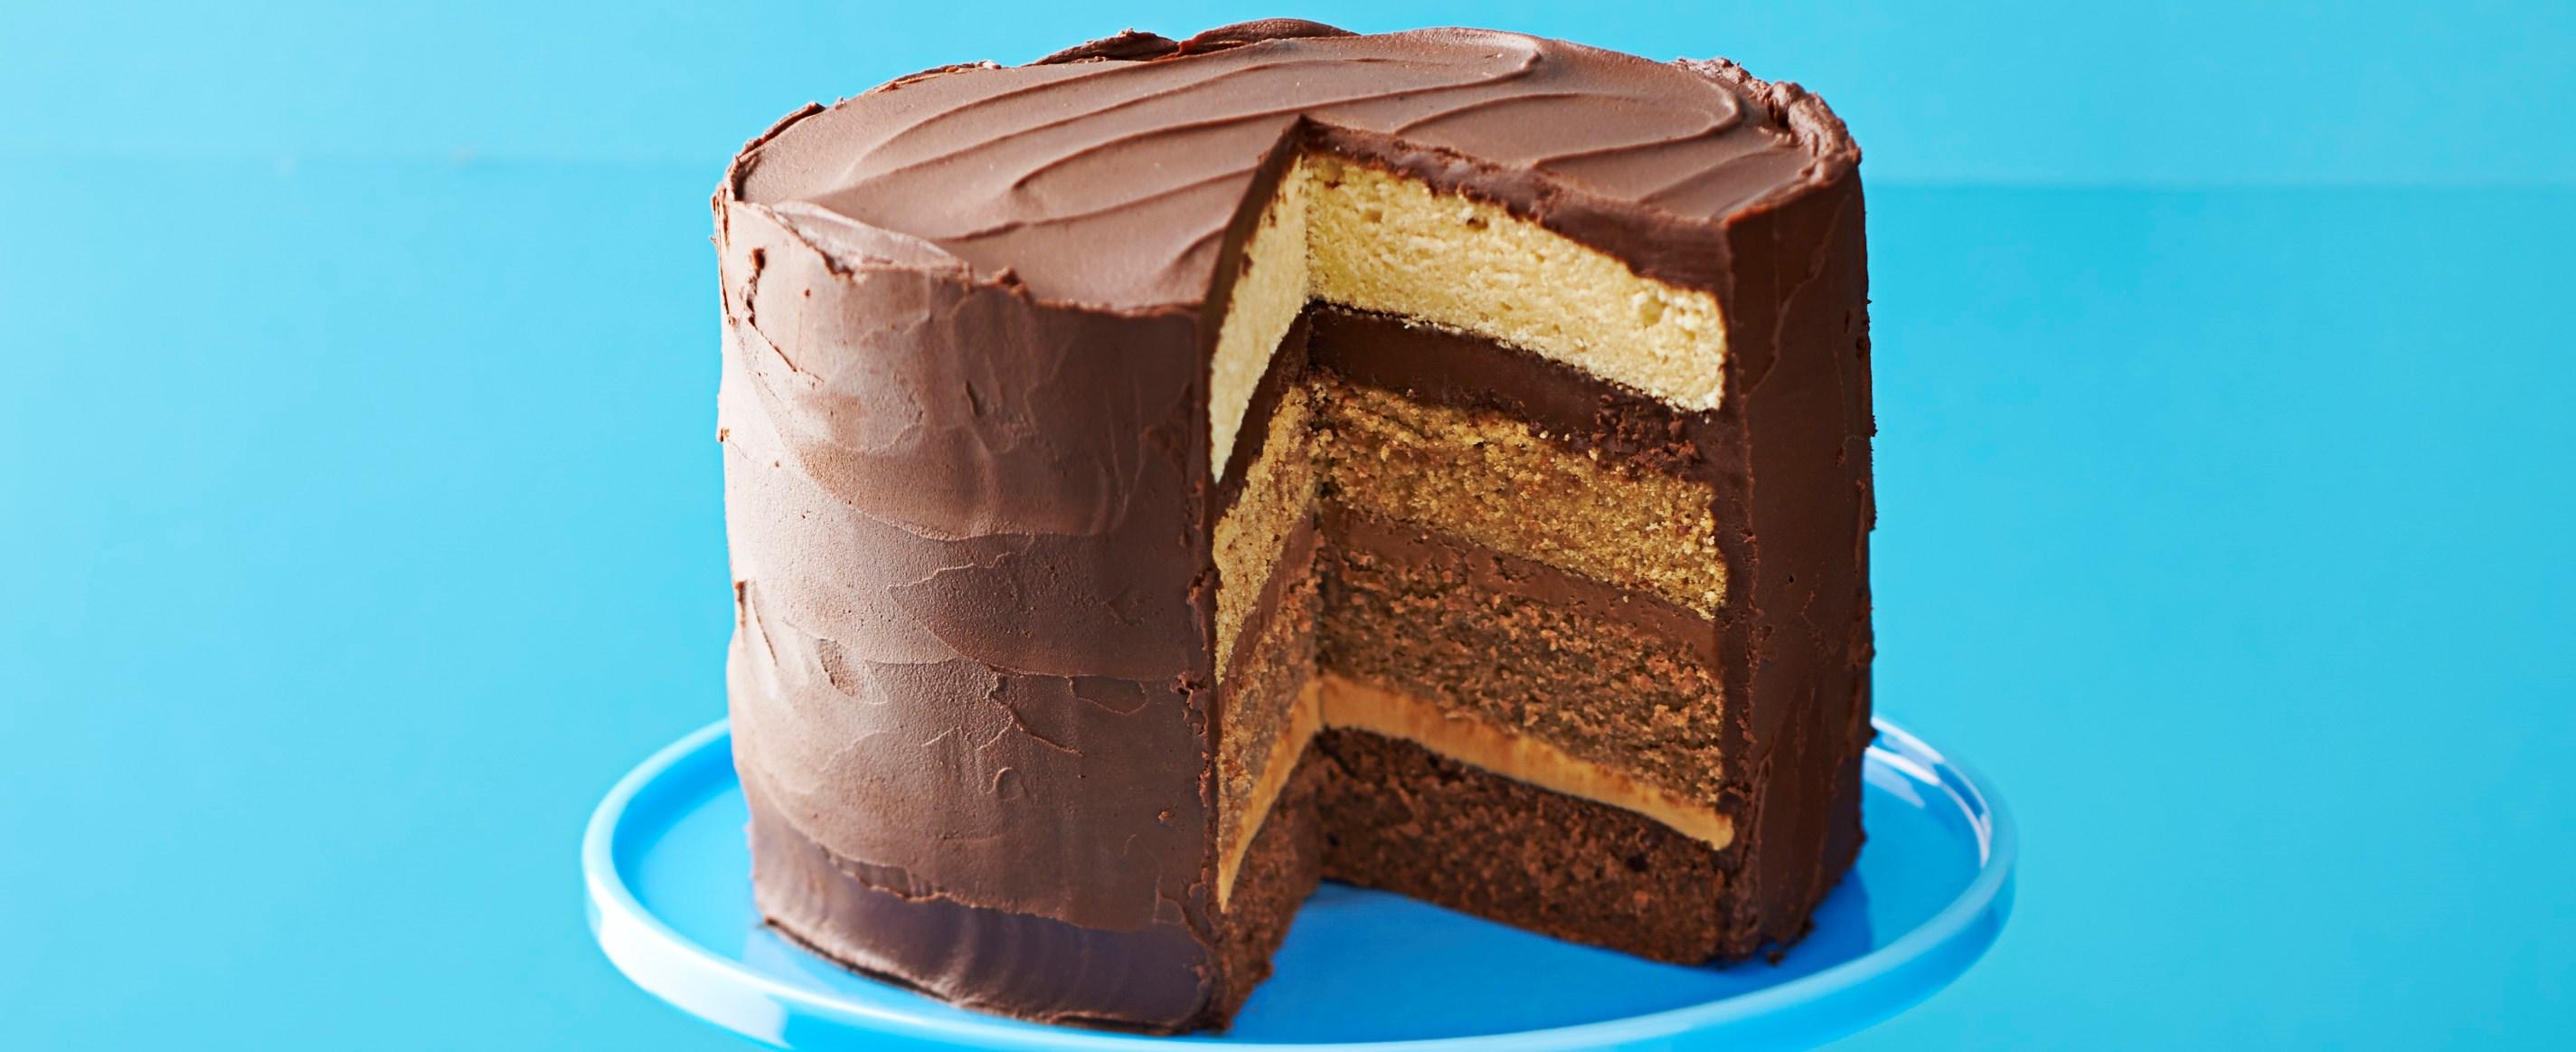 Triple chocolate caramel cake